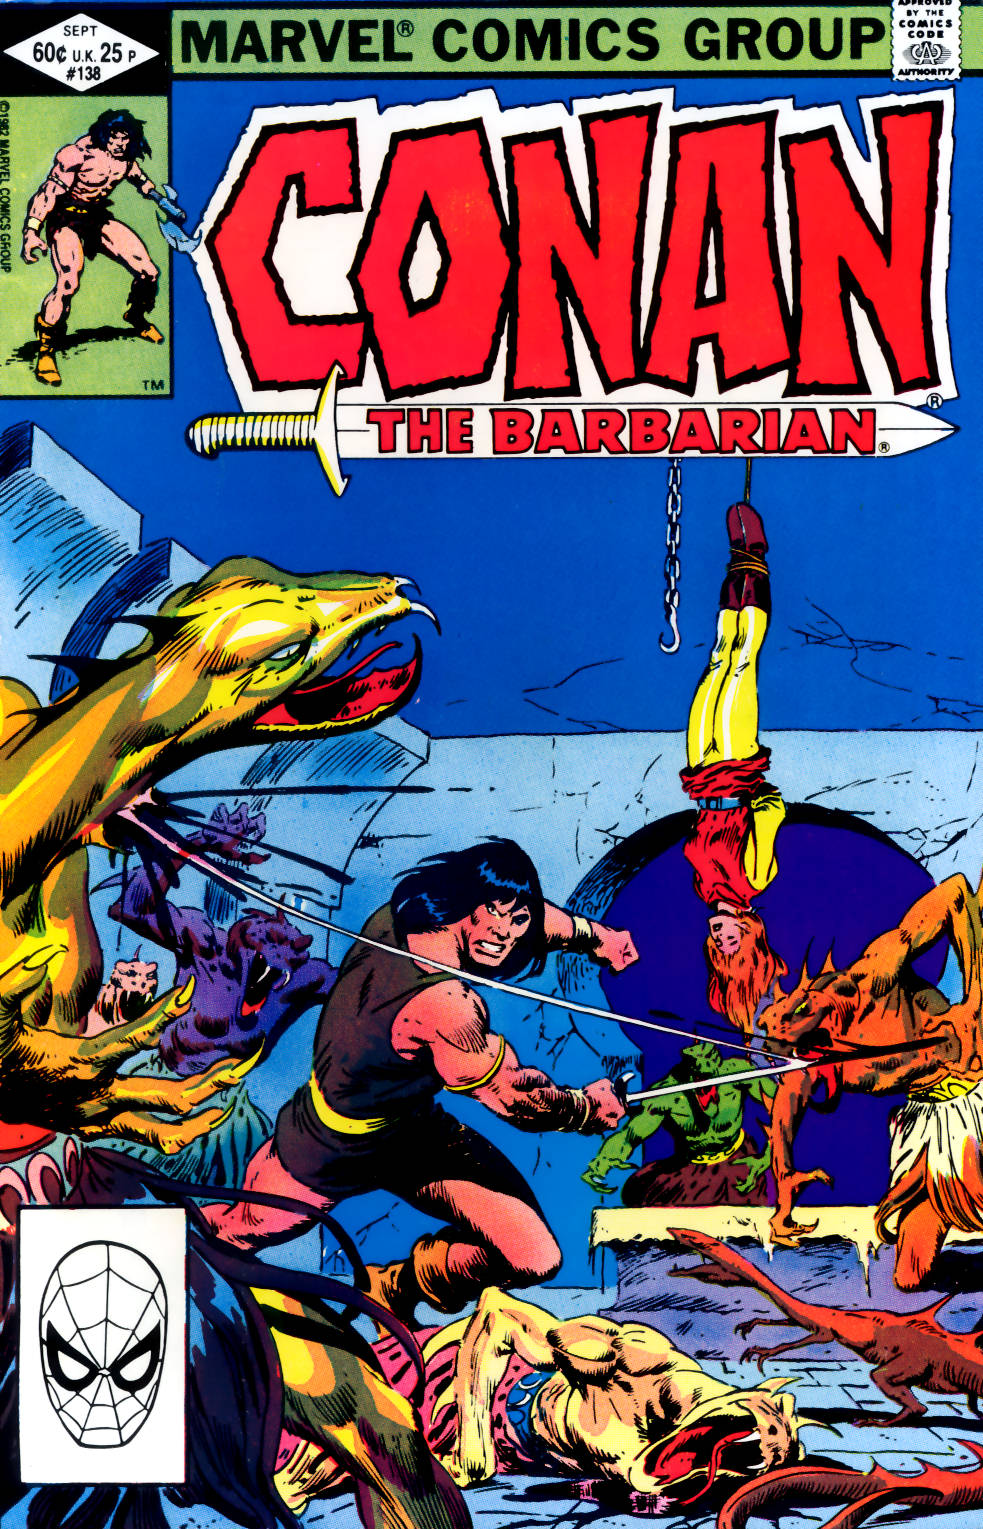 Conan the Barbarian 138